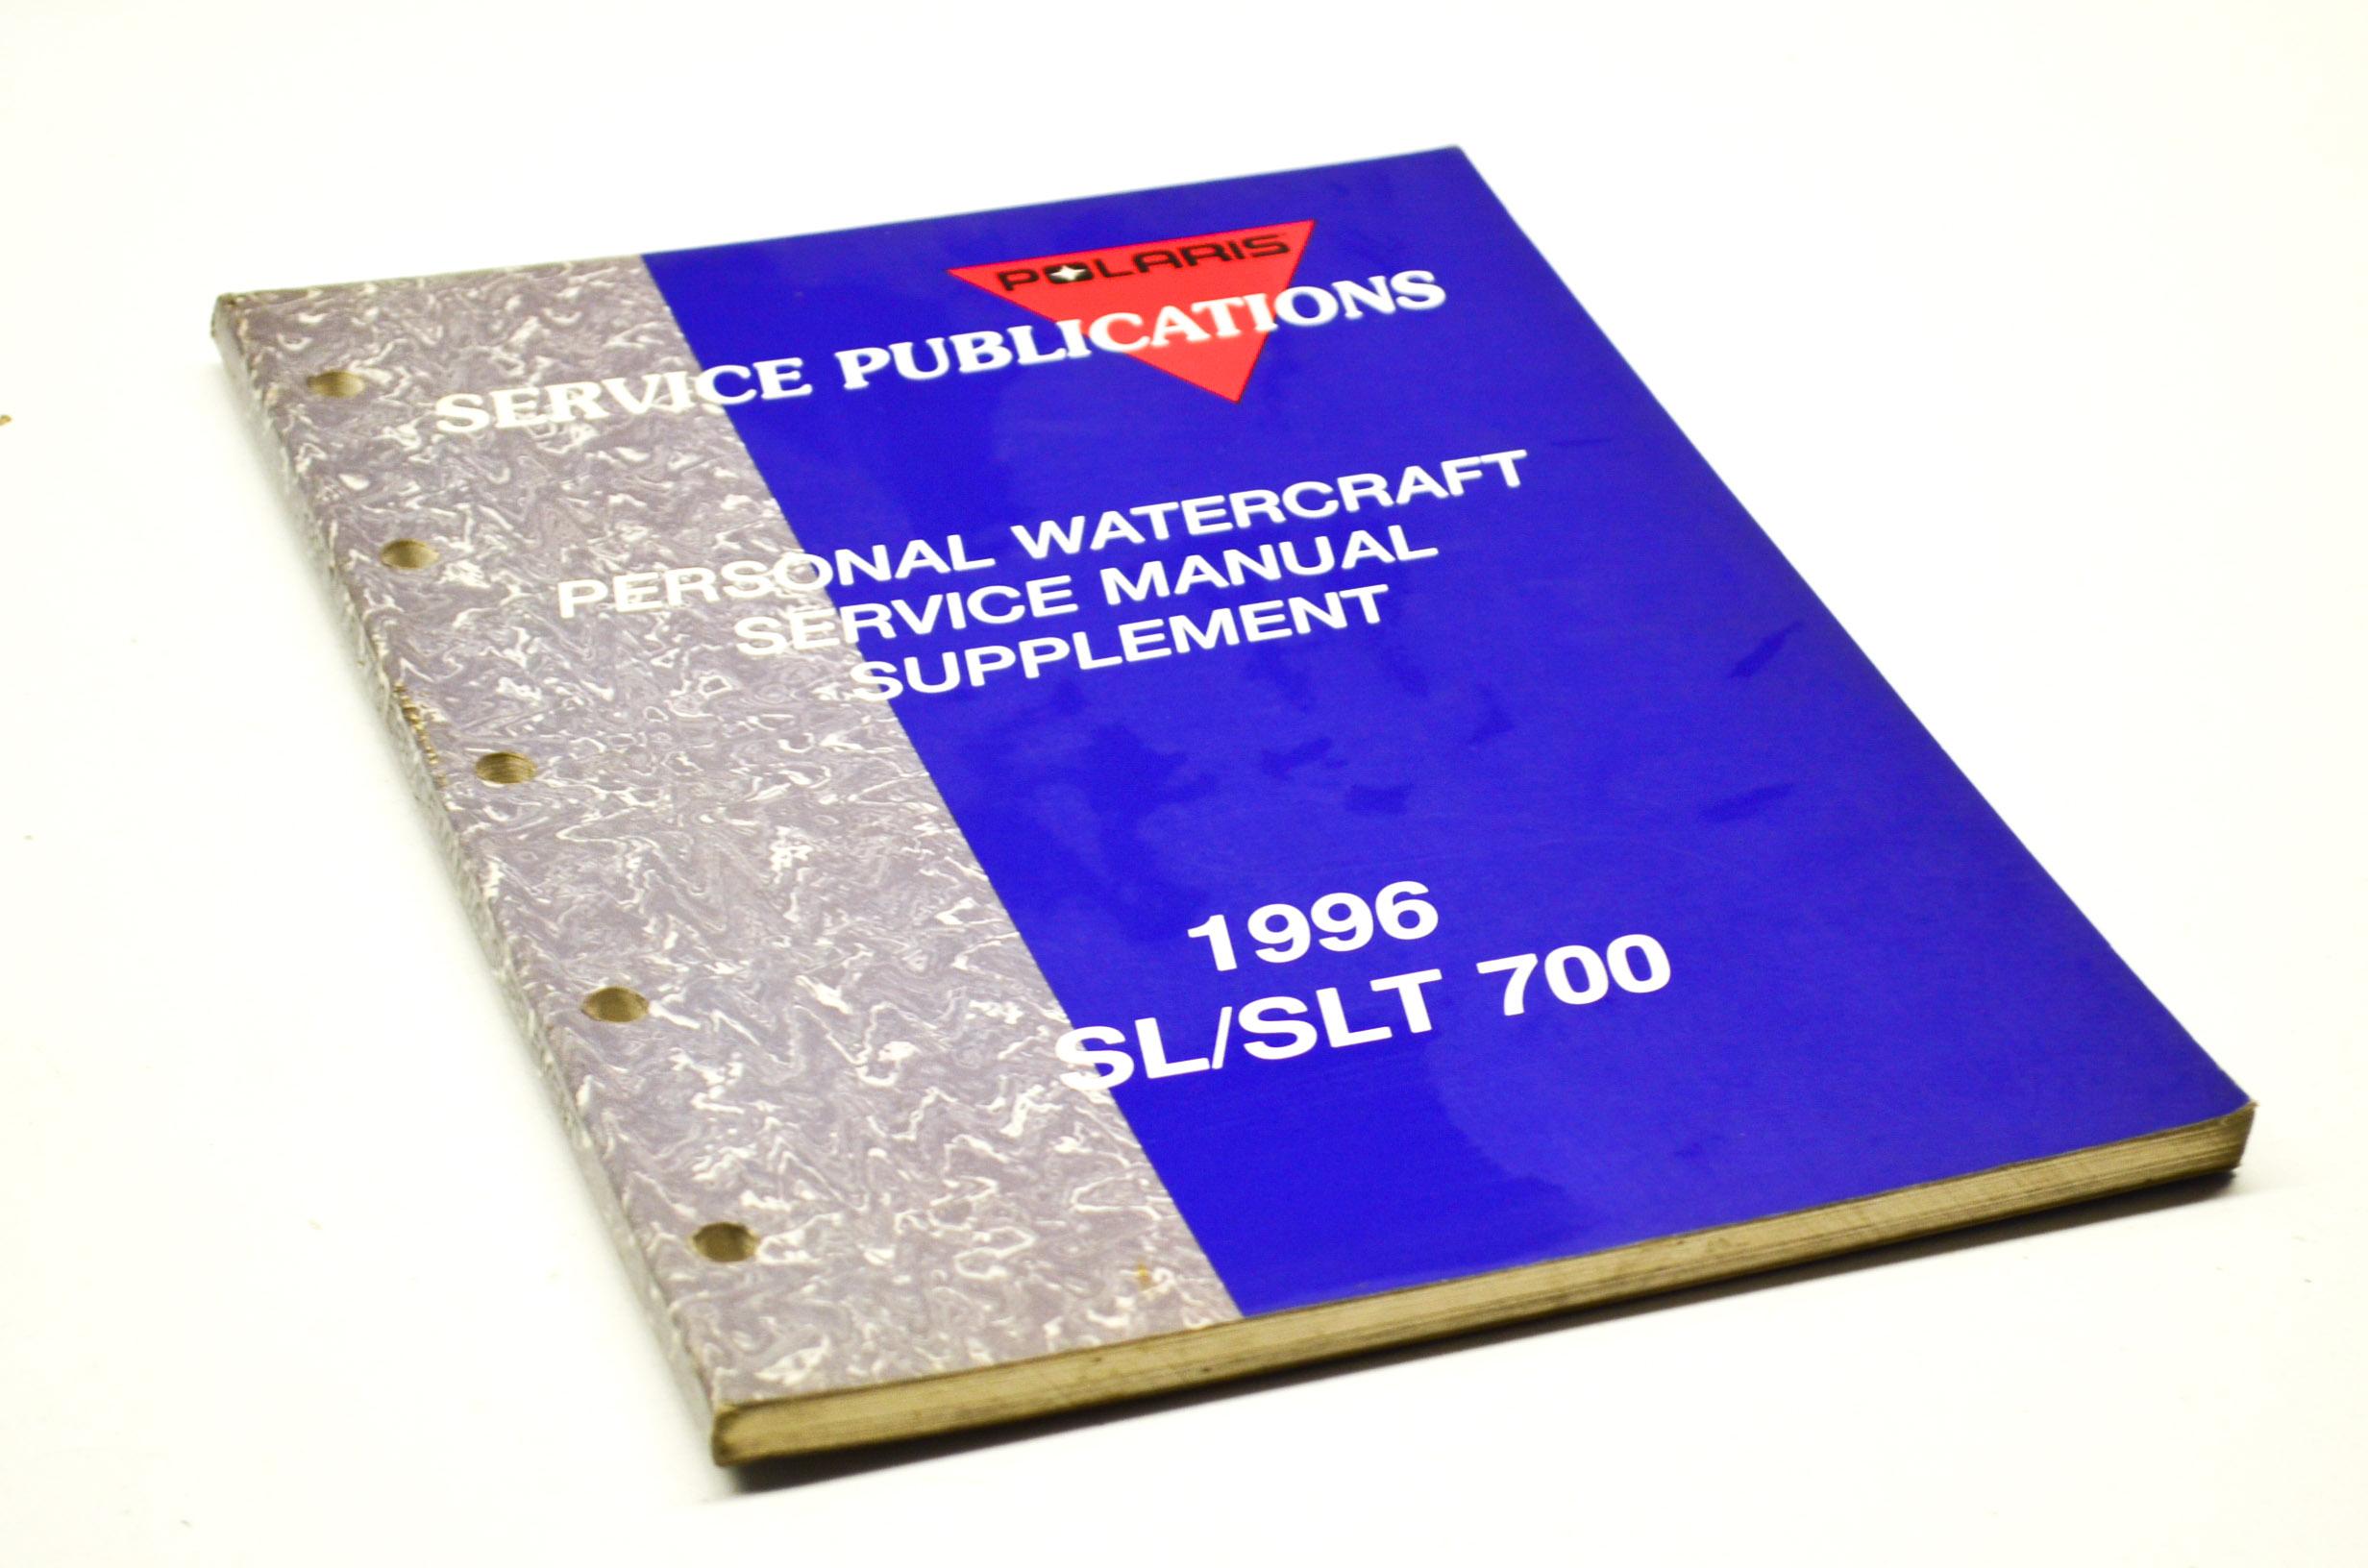 1996 polaris pwc manual ebook array polaris slt 700 service manual open source user manual u2022 rh dramatic varieties com fandeluxe Gallery